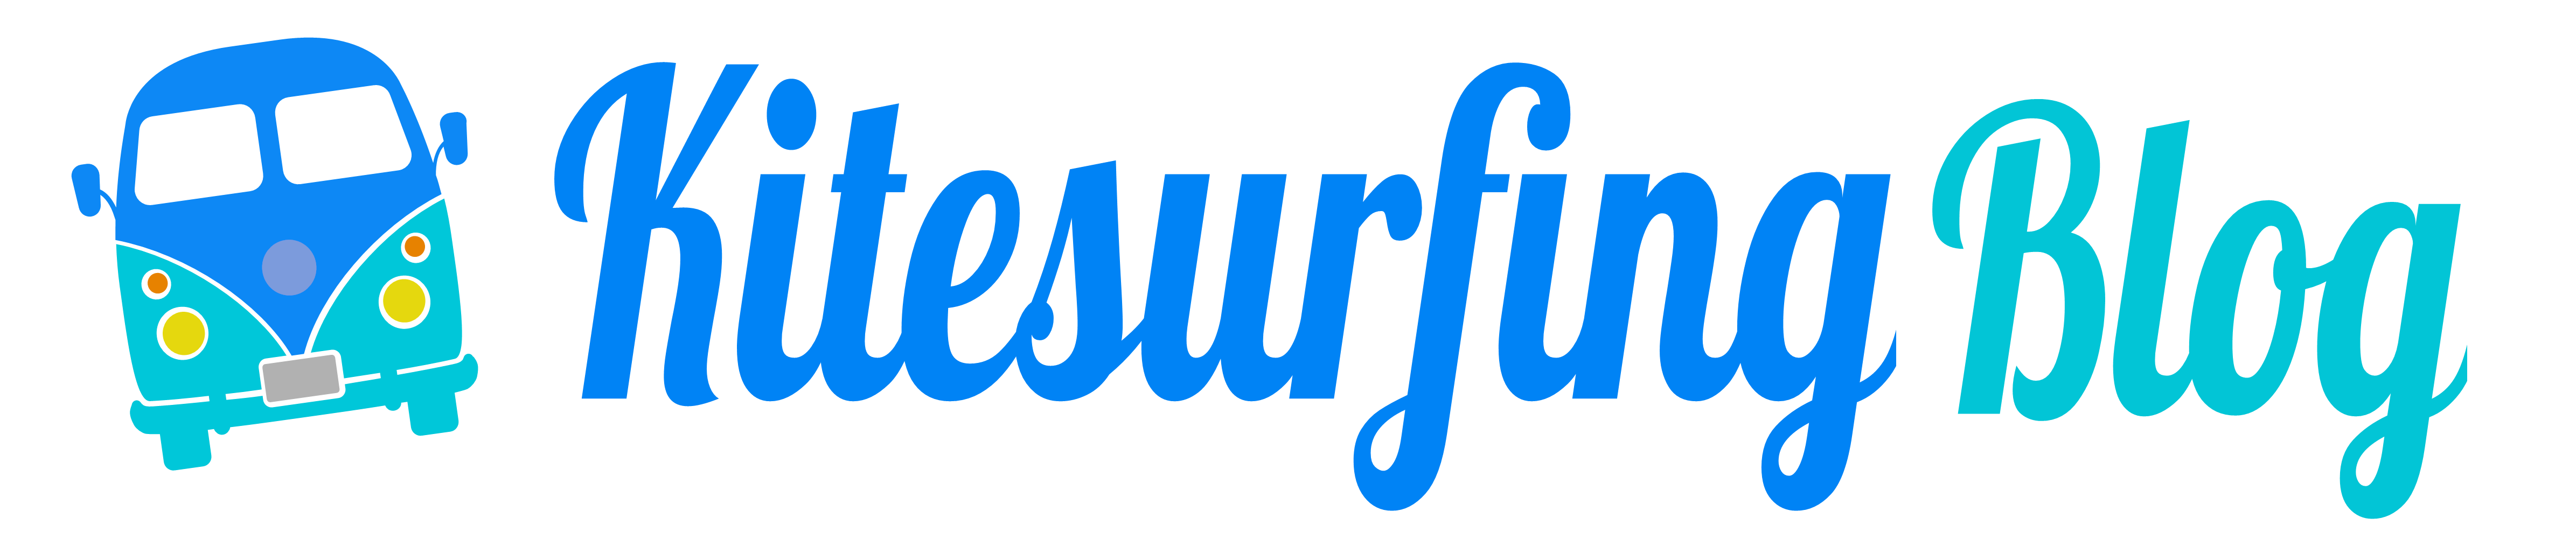 Kitesurfing Blog